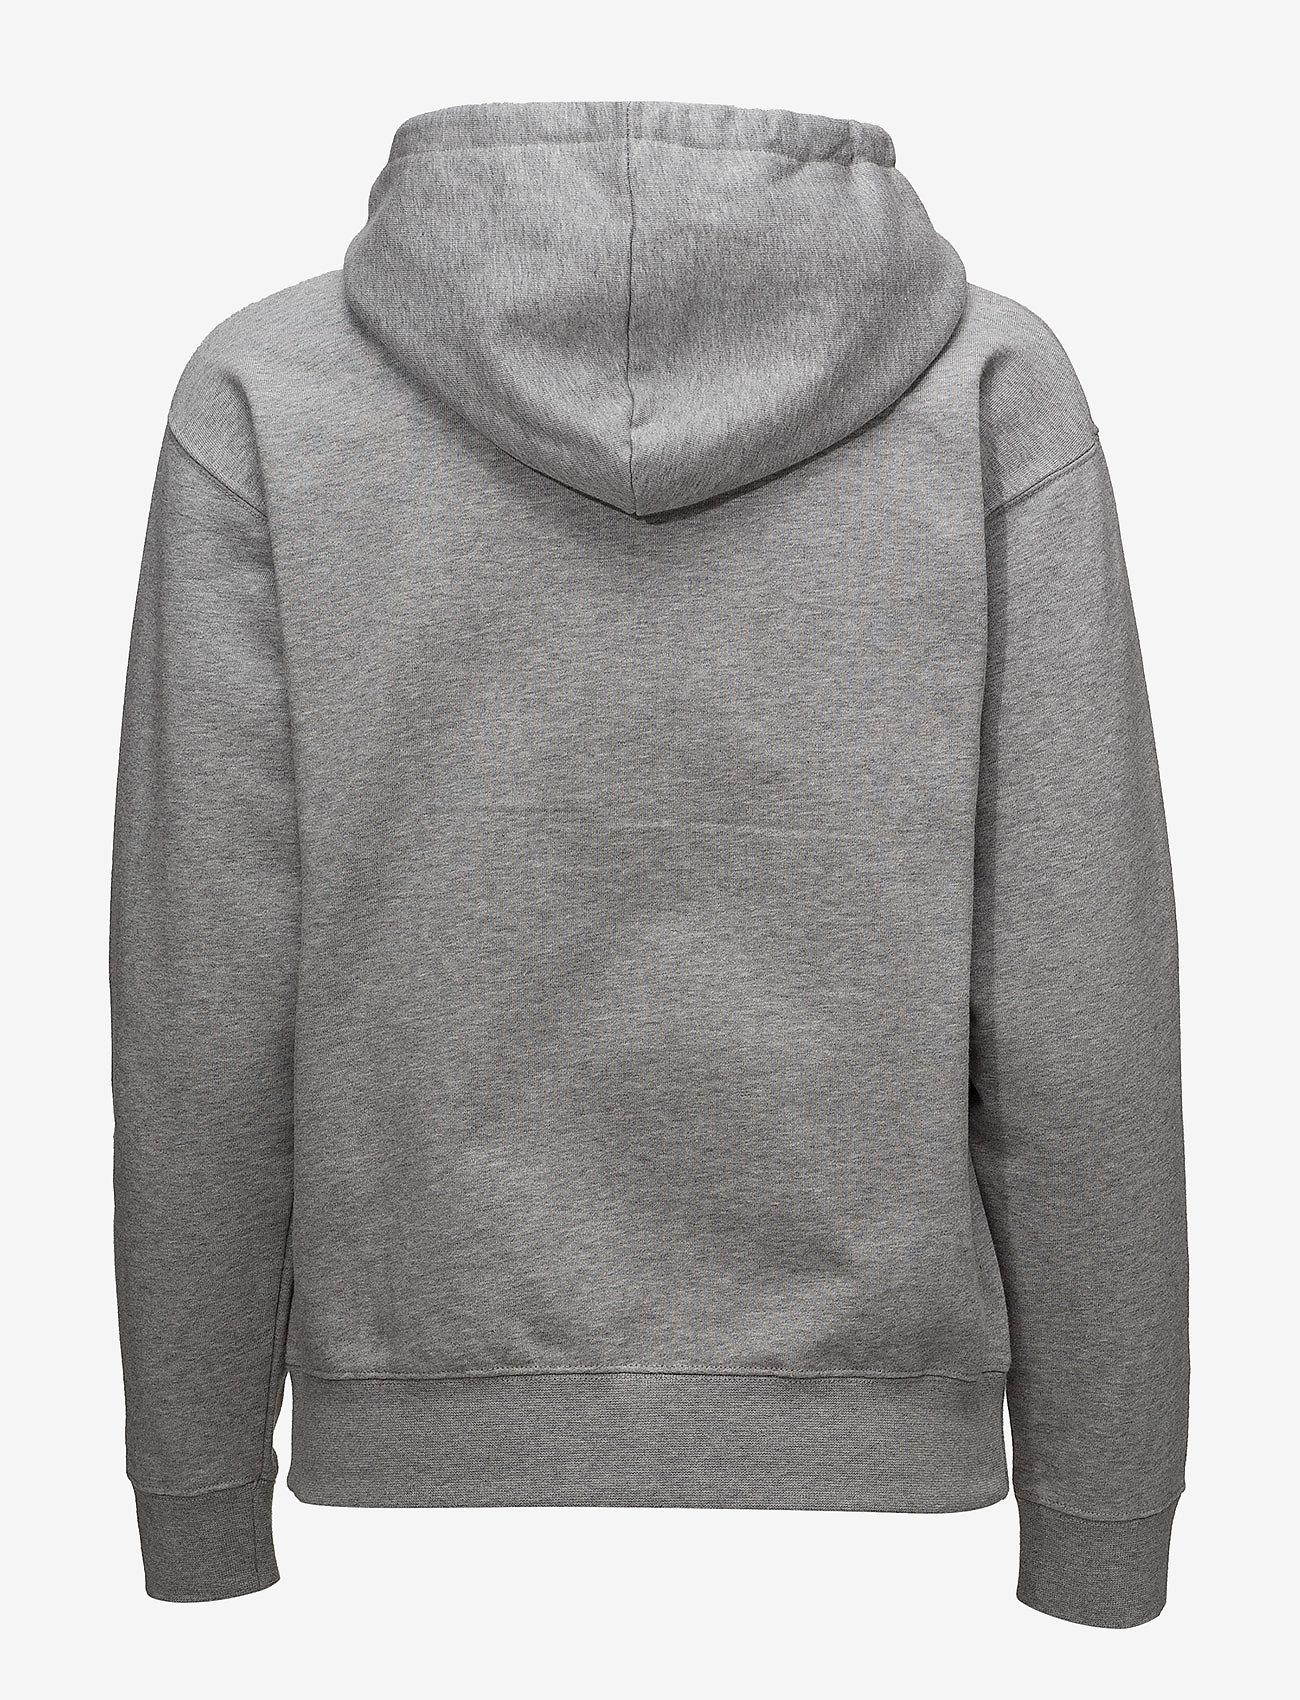 Wood Wood - Jenn hoodie - hettegensere - grey melange - 1